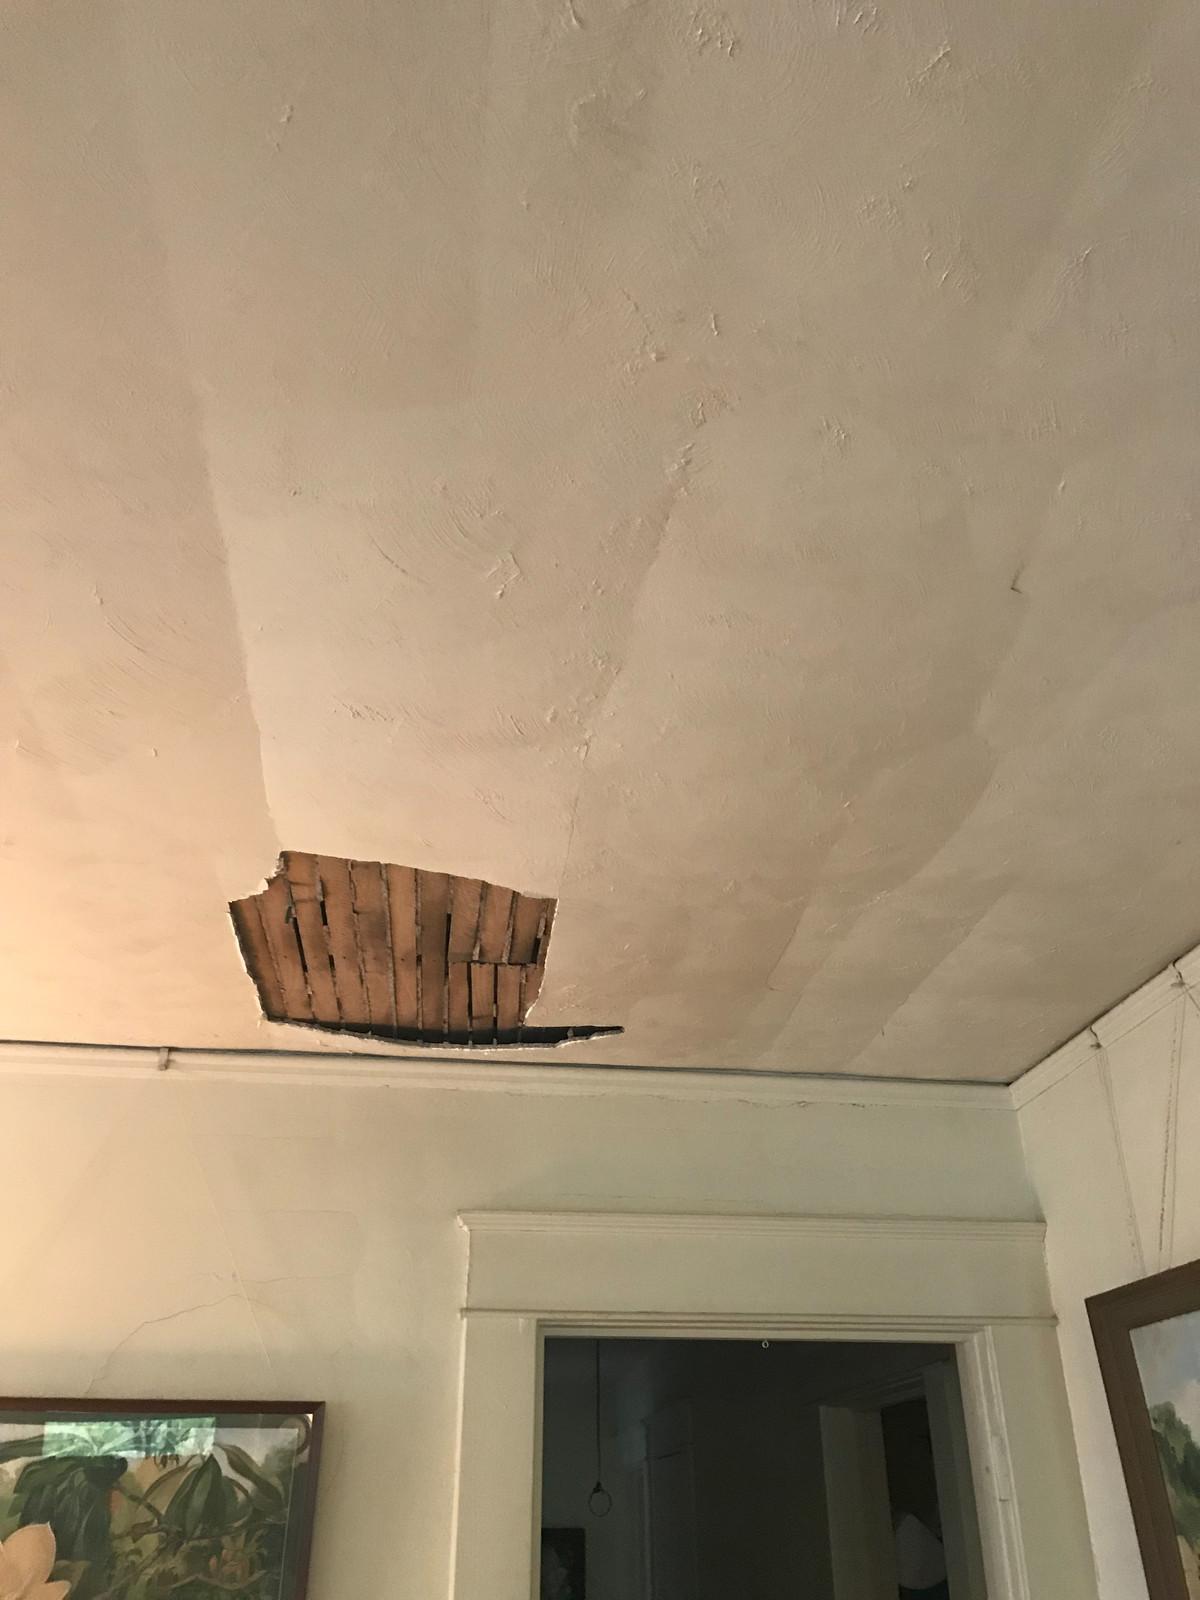 Ceiling Cracks: Serious or Not? | Estate Plaster